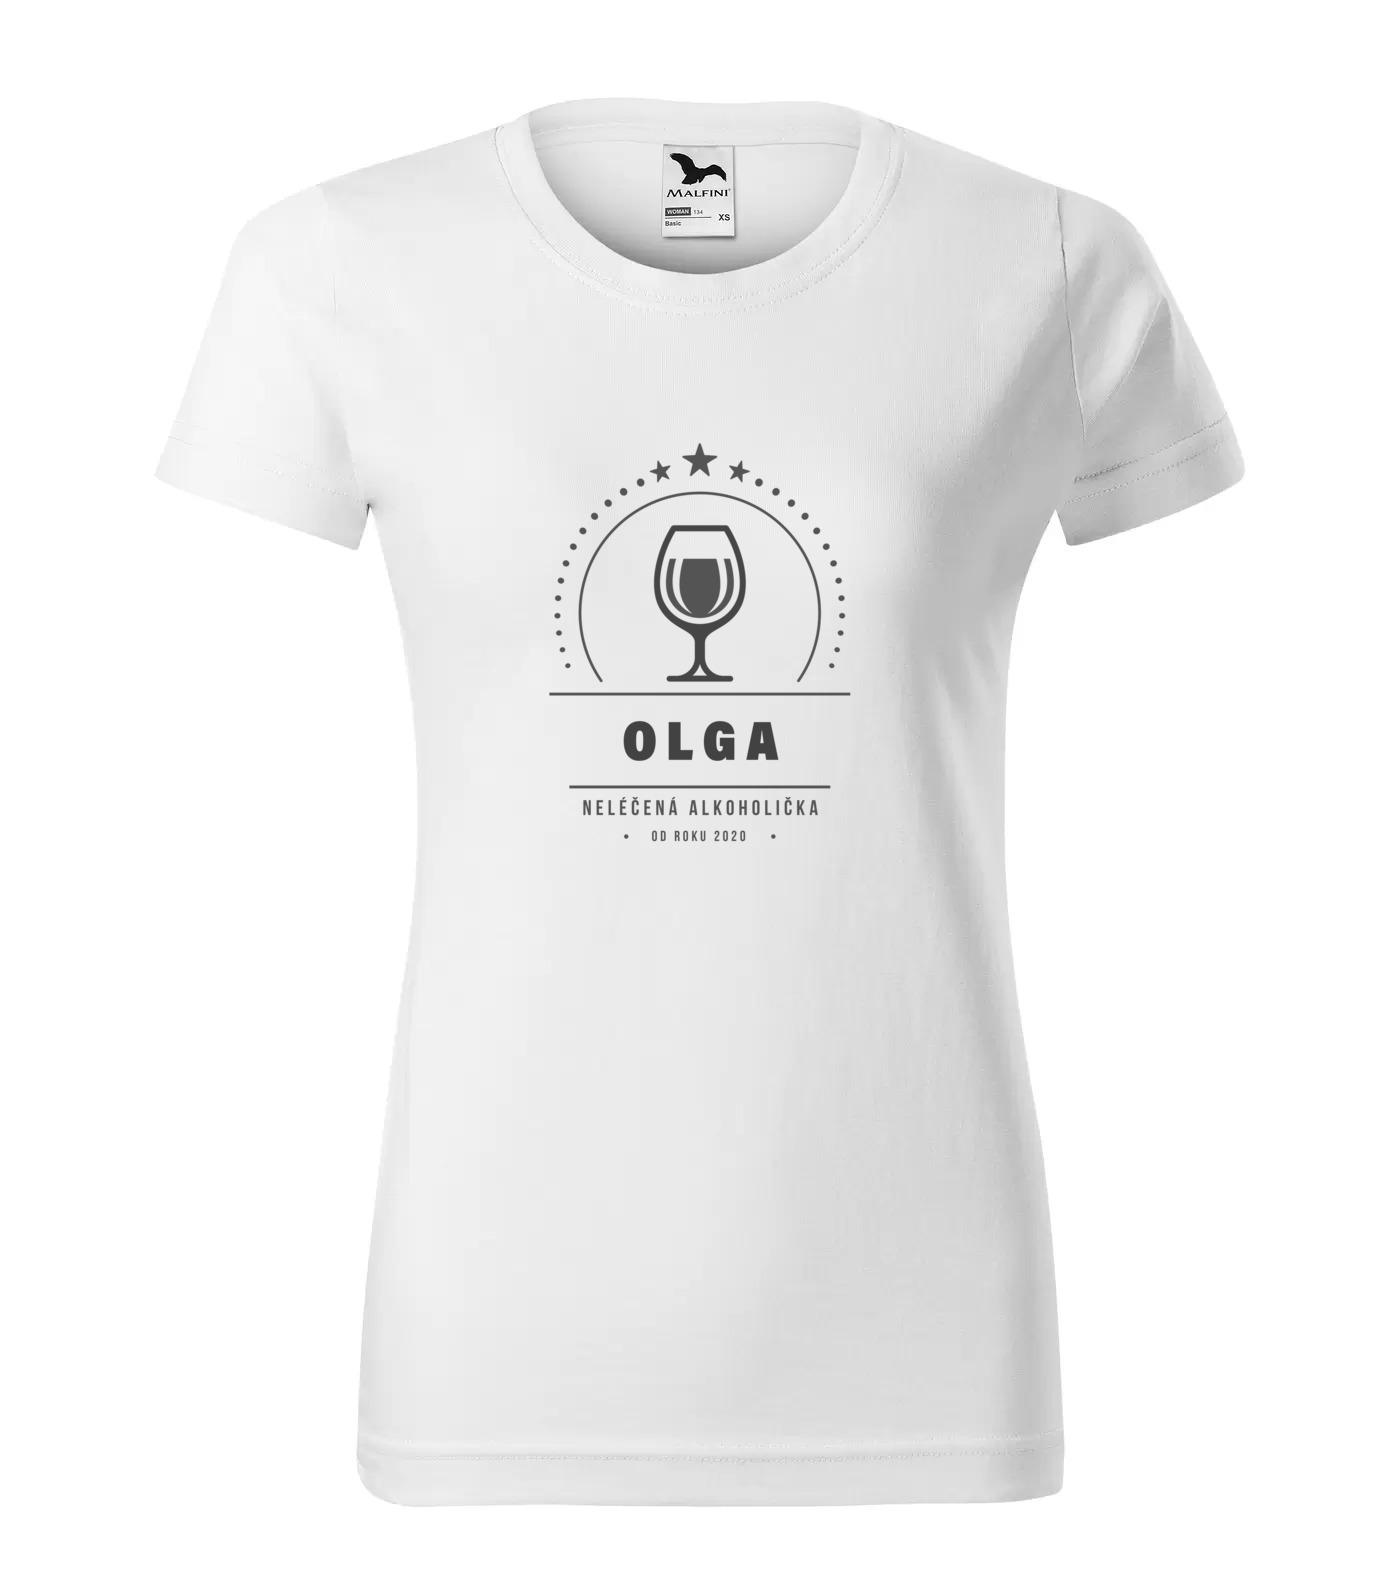 Tričko Alkoholička Olga